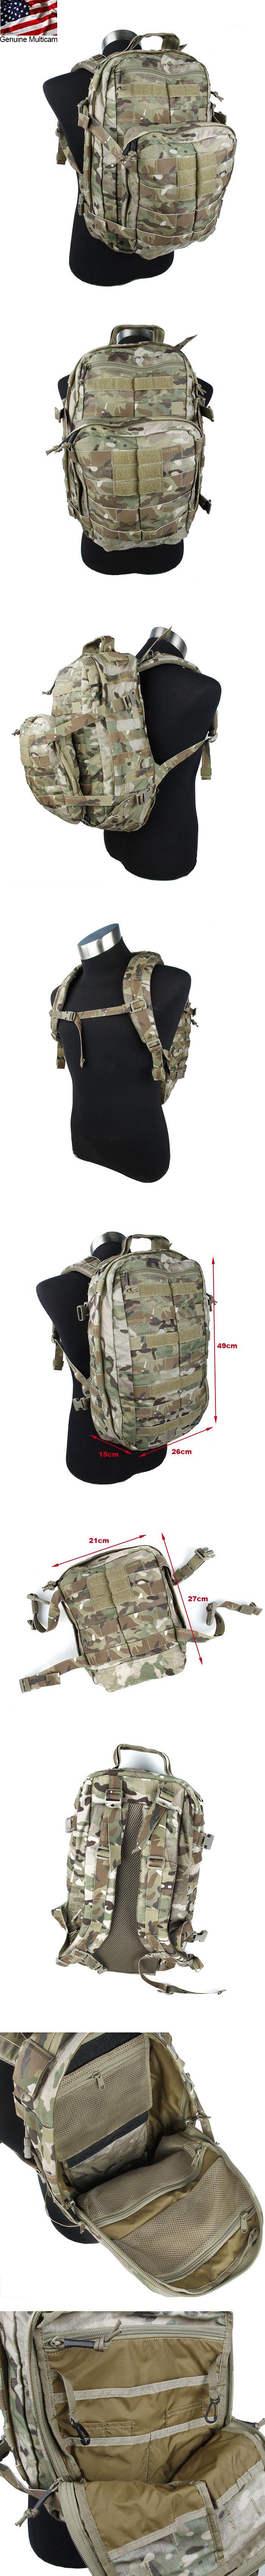 EbairSoft Airsoft parts & Tactical Gear - G TMC M22 Three Day Assault Pack ( Multicam ) TMC2721-MC